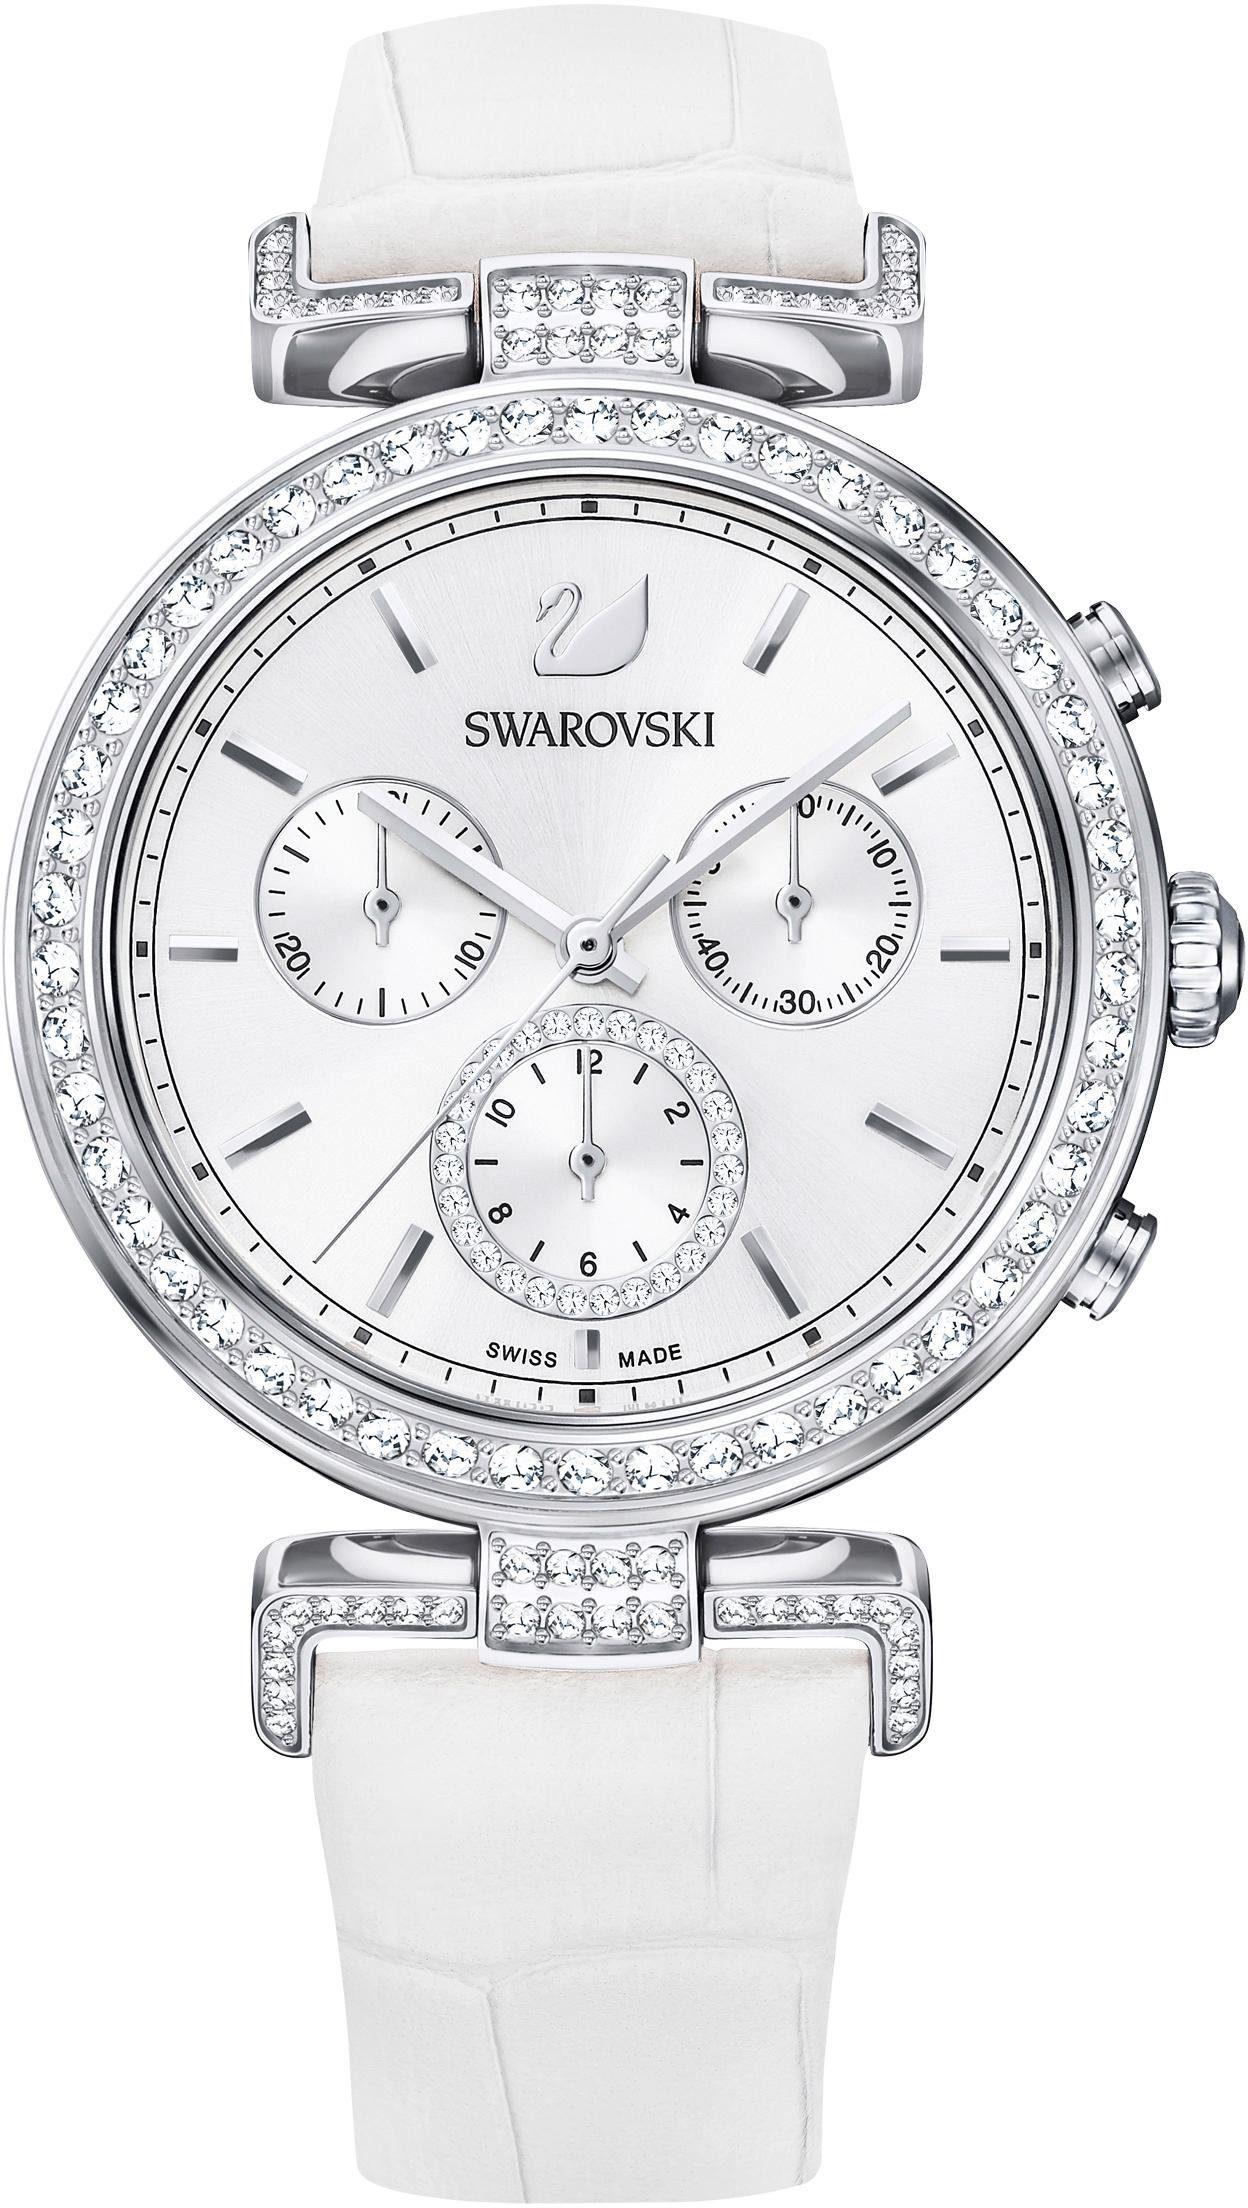 Swarovski Chronograph »Era Journey Uhr, Lederarmband, weiss, silberfarben, 5295346«